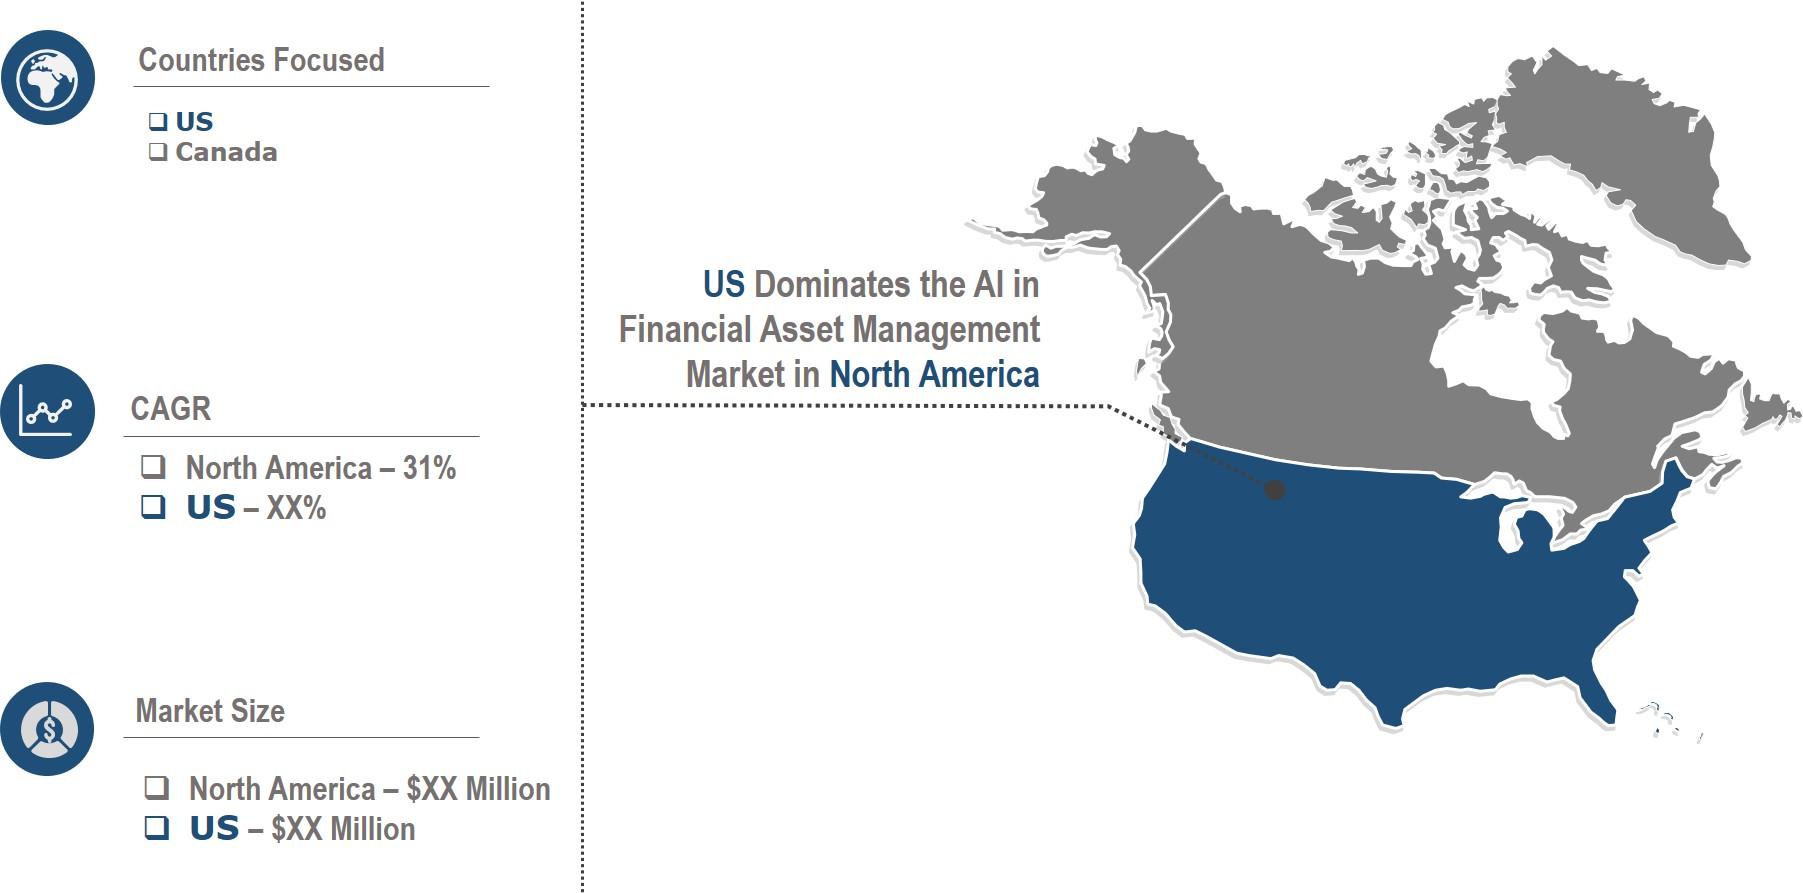 AI in Financial Asset Management Market